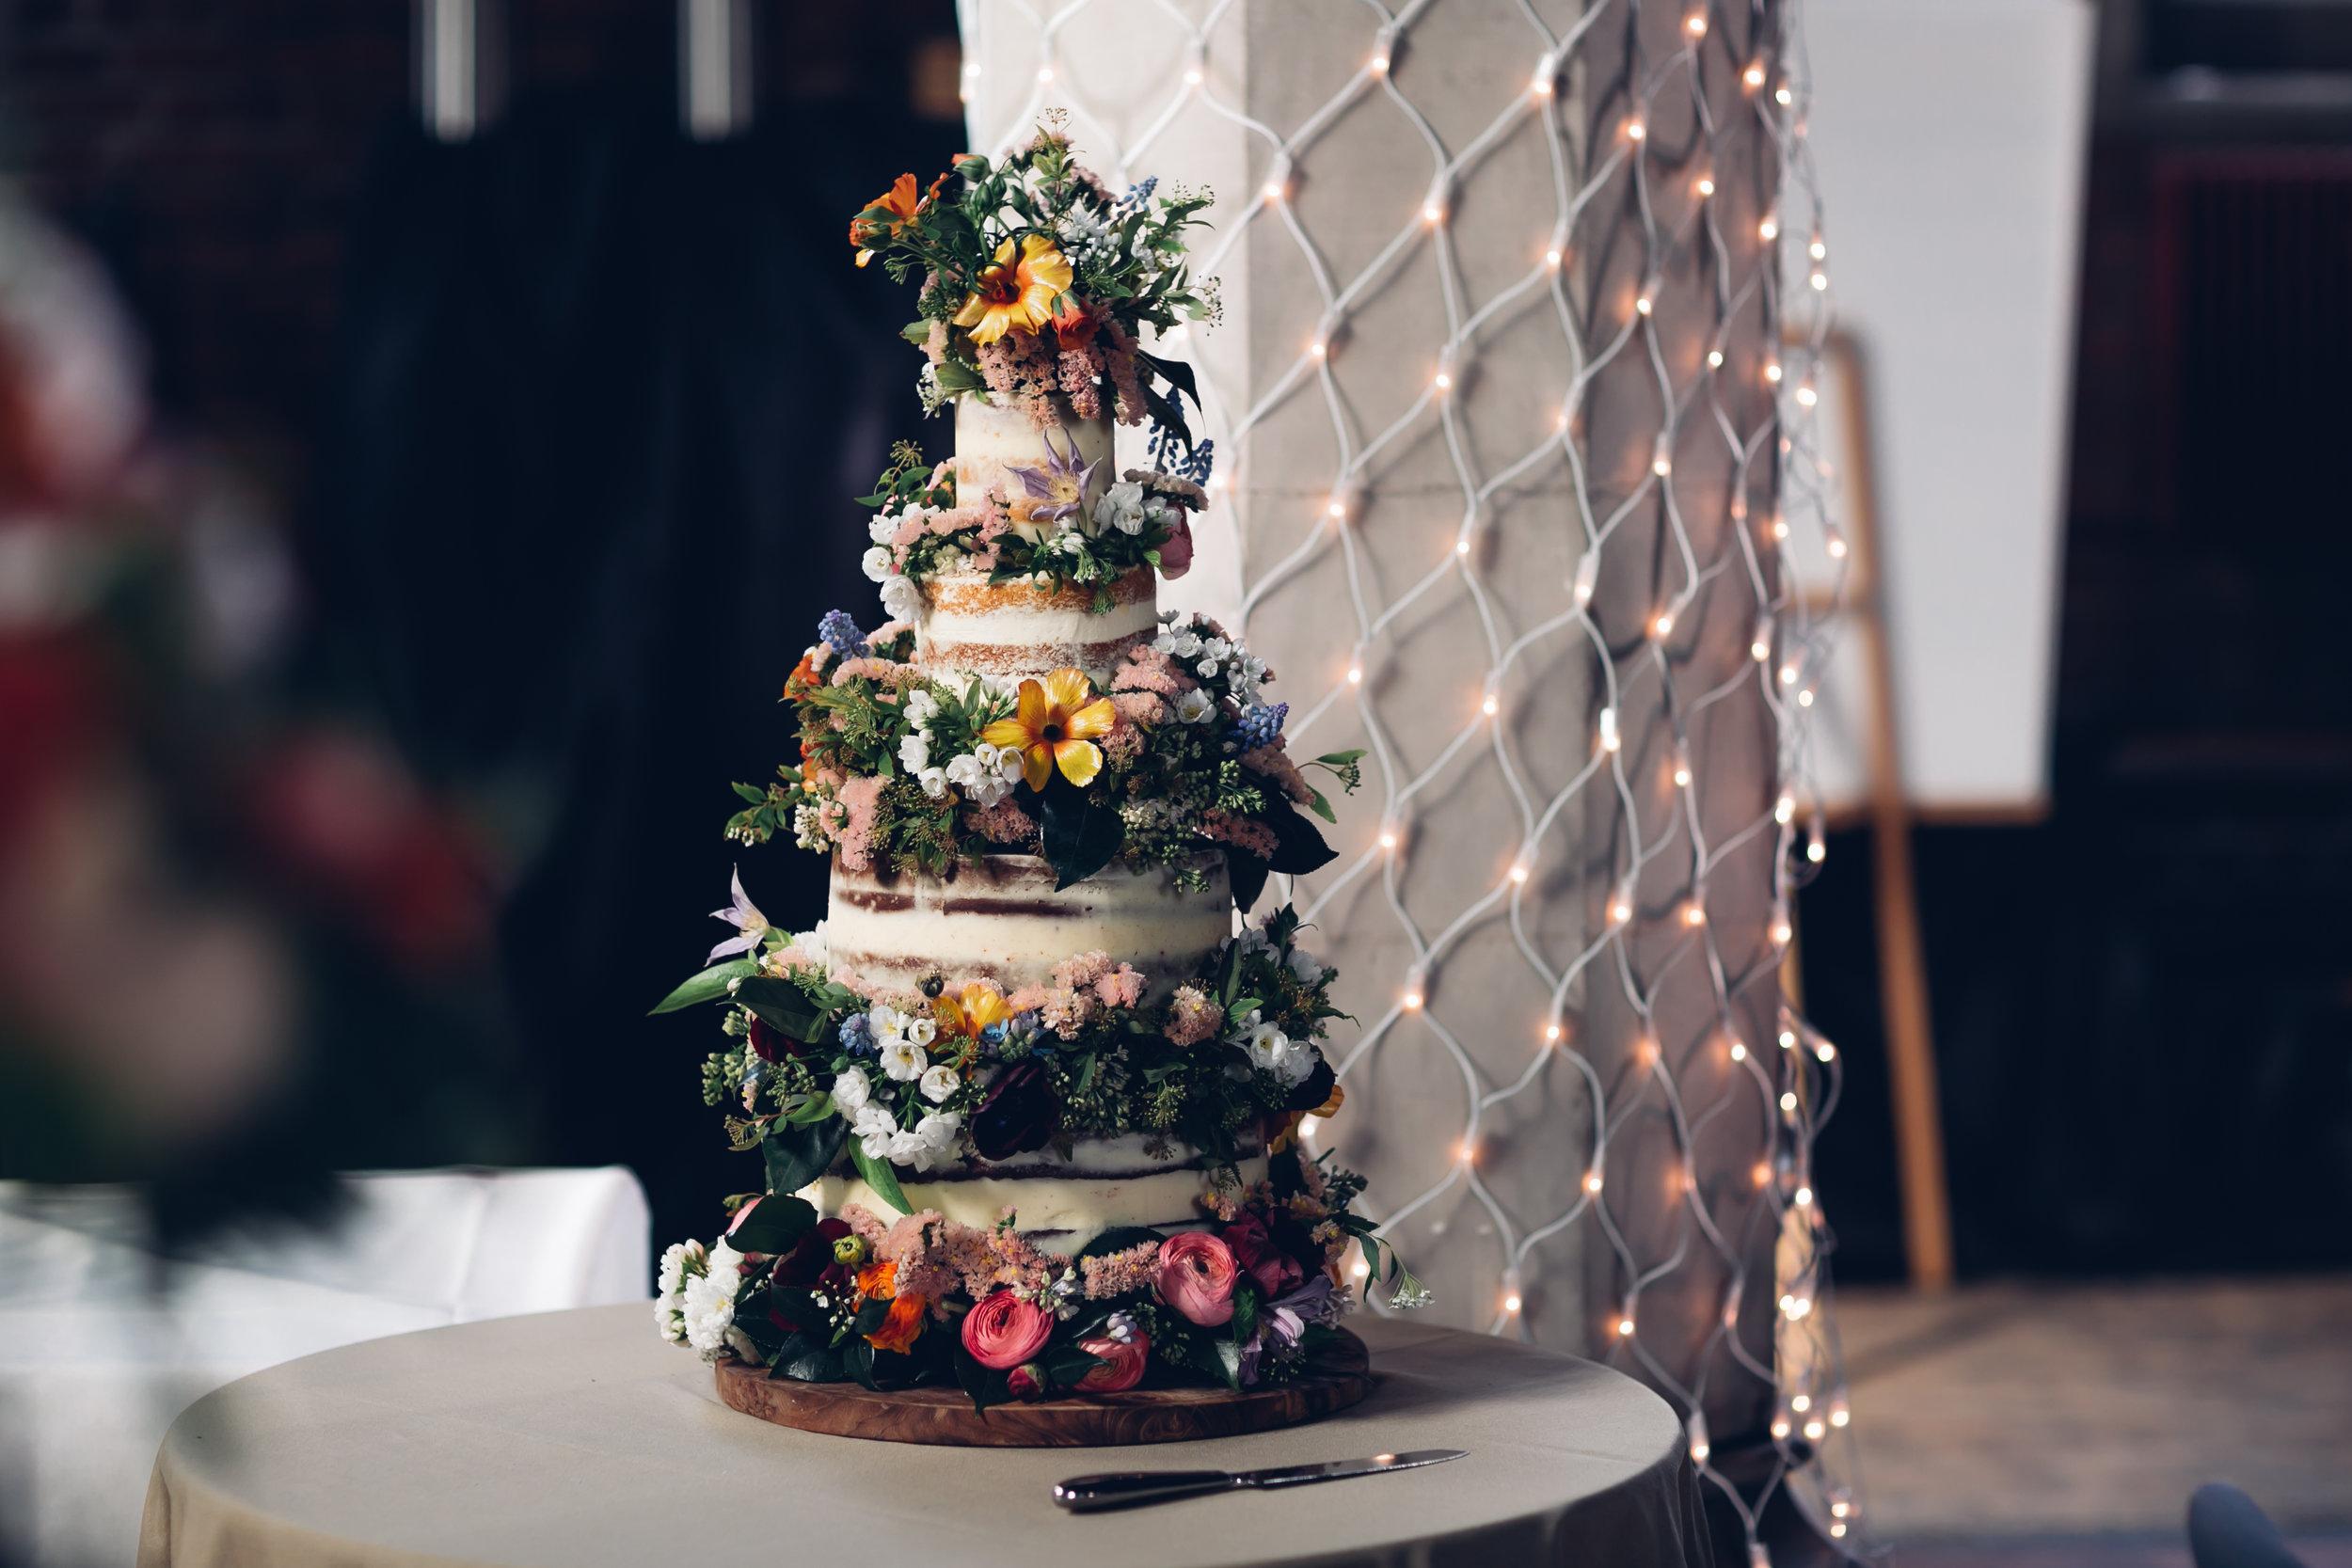 The Hill Food Company wedding cake photo credit @moeez.JPG